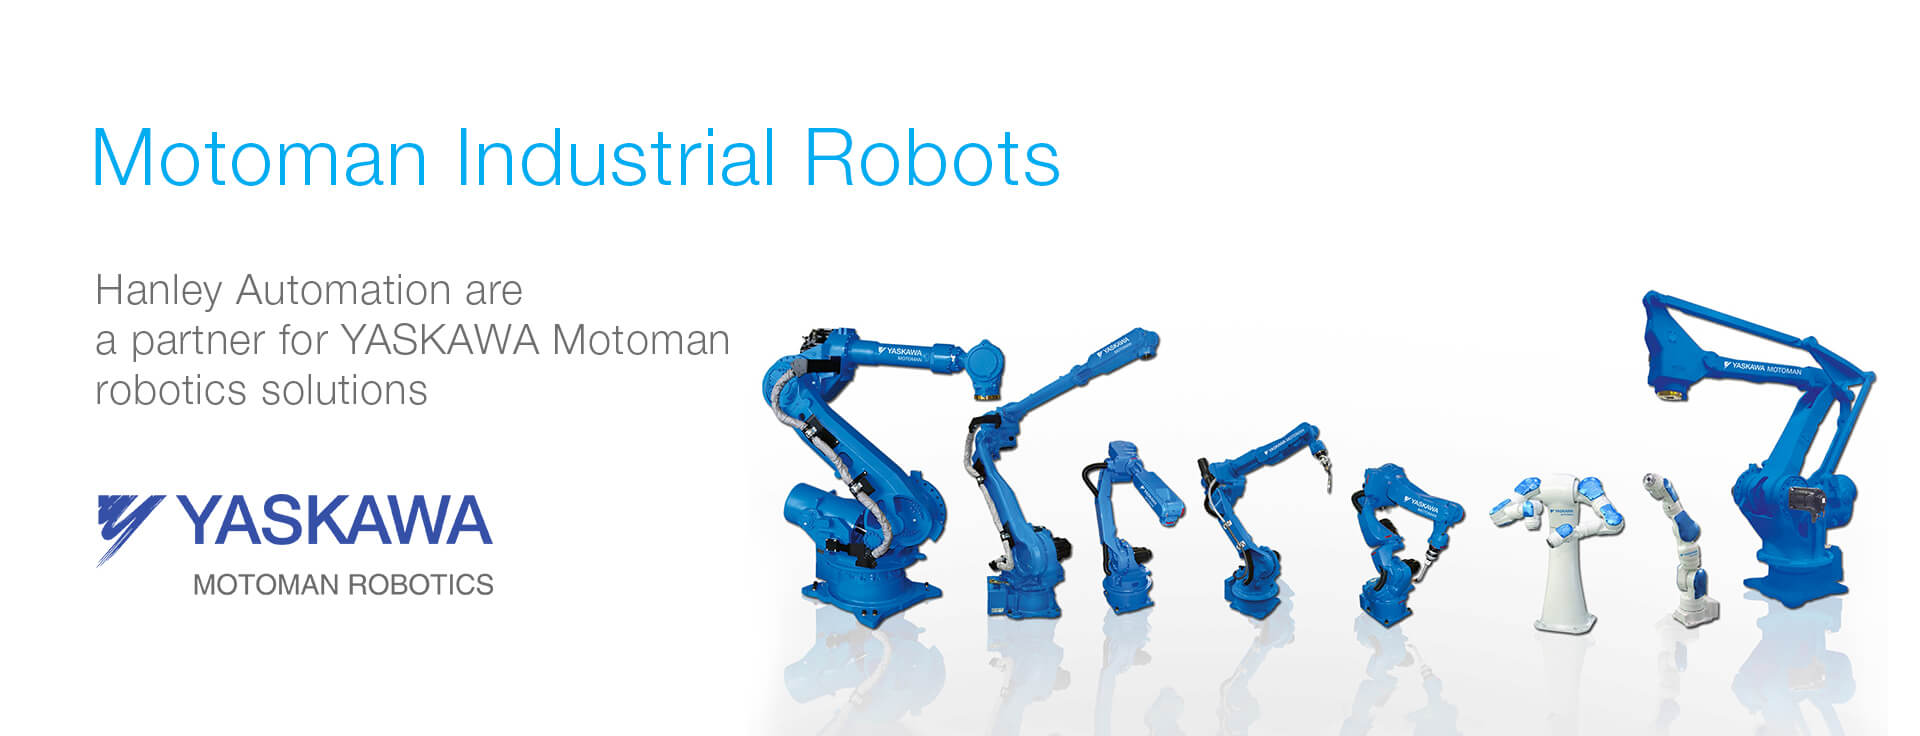 Motoman-Industrial-Robots (1)